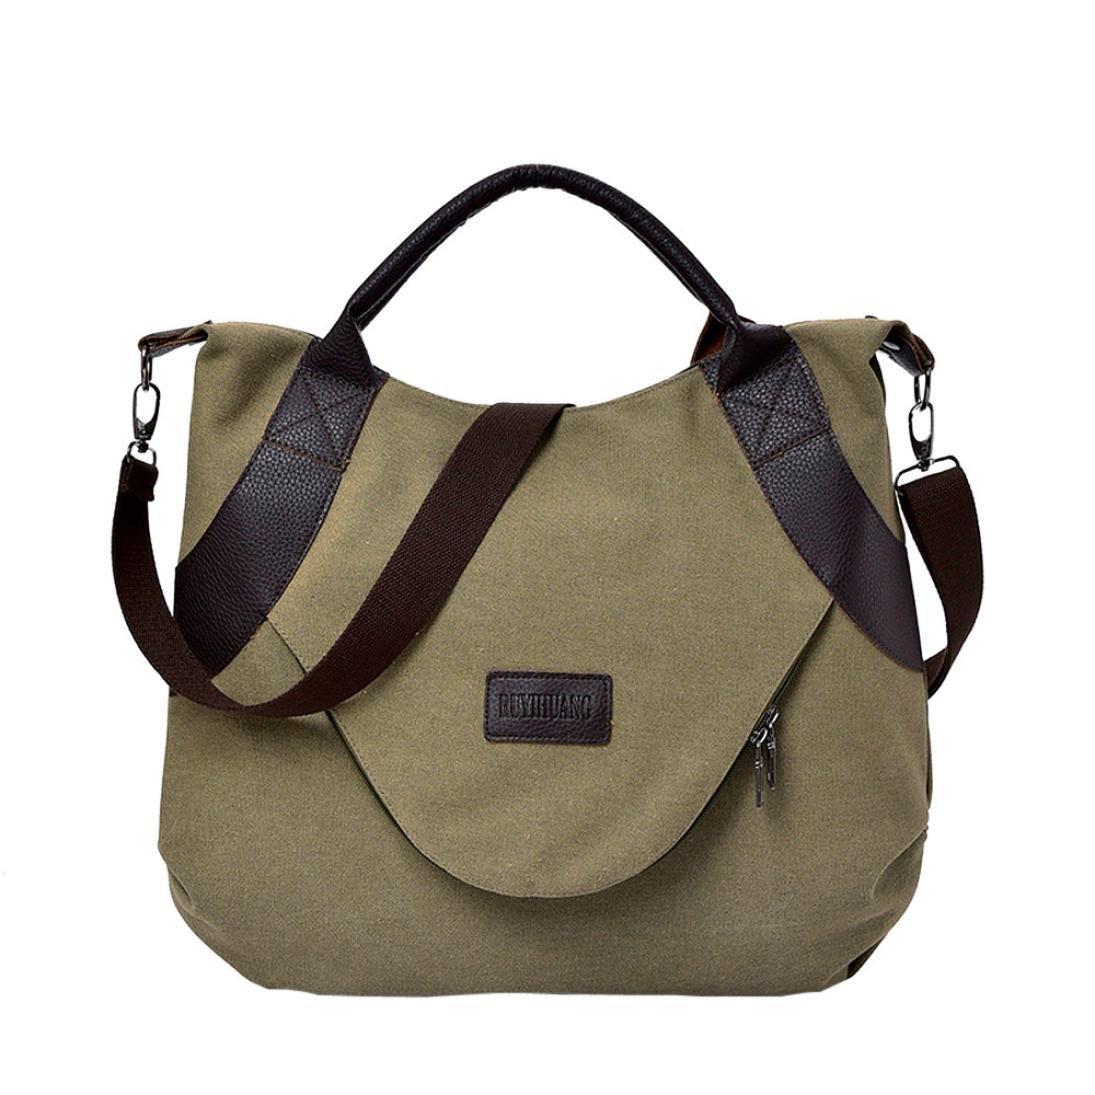 YJYDADA Bag,Retro Women's Canvas Zipper Shoulder Bags With Corssbody Bag&Handbag (Army Green)